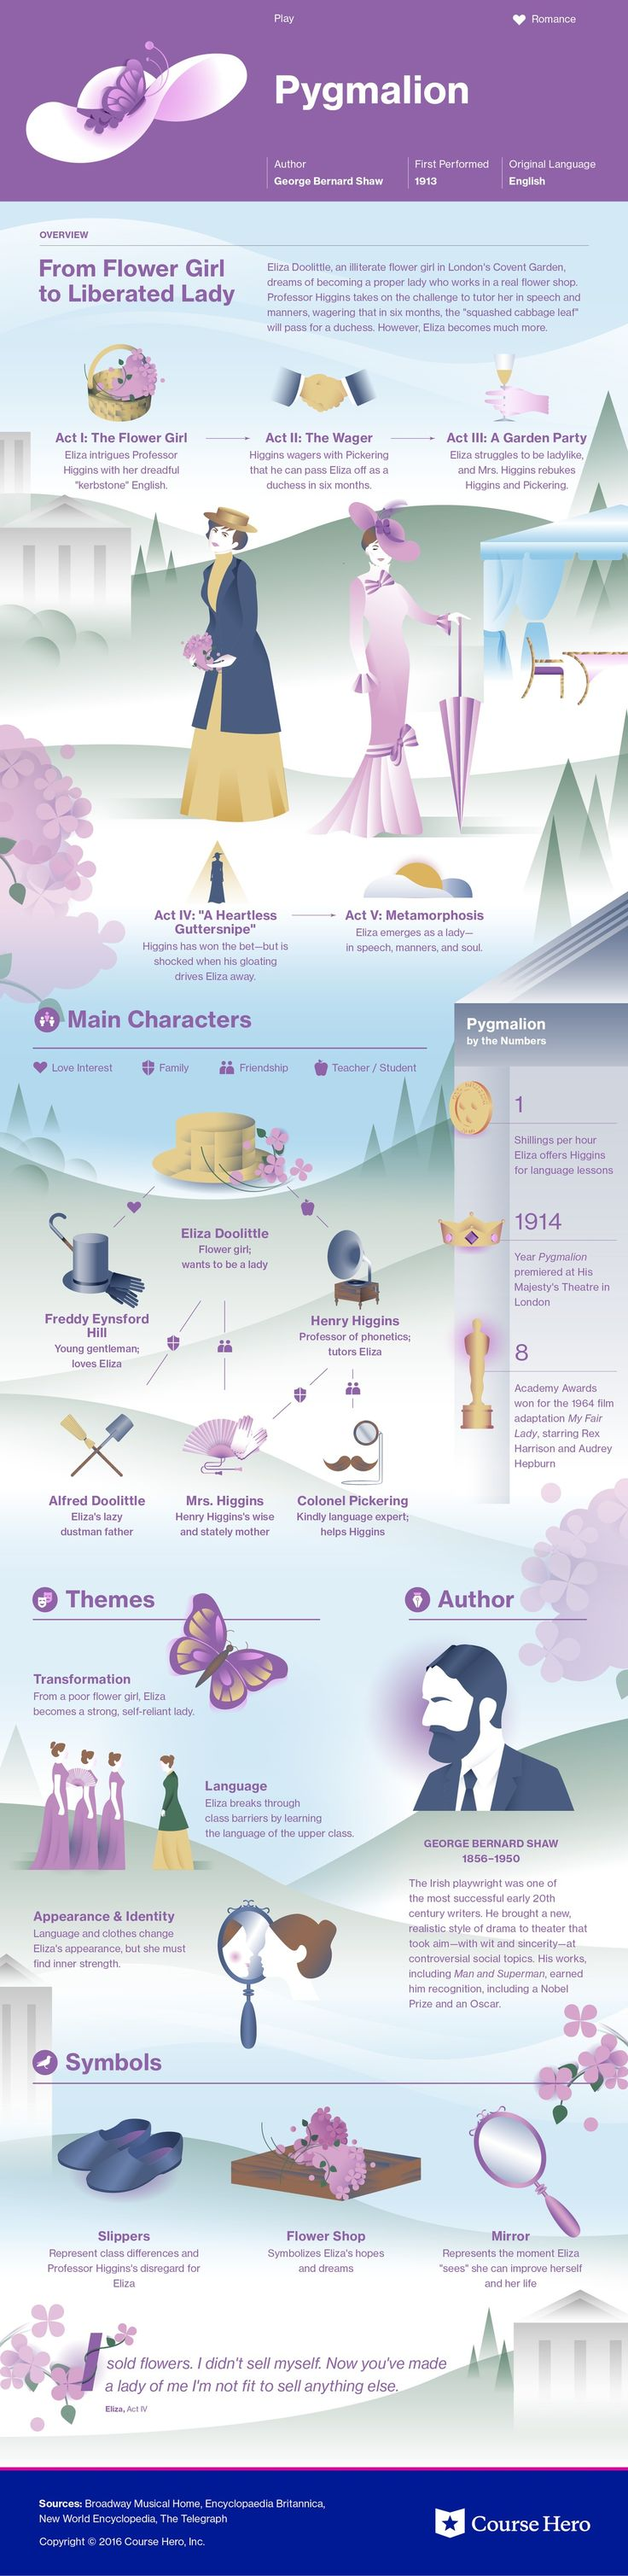 Pygmalion infographic